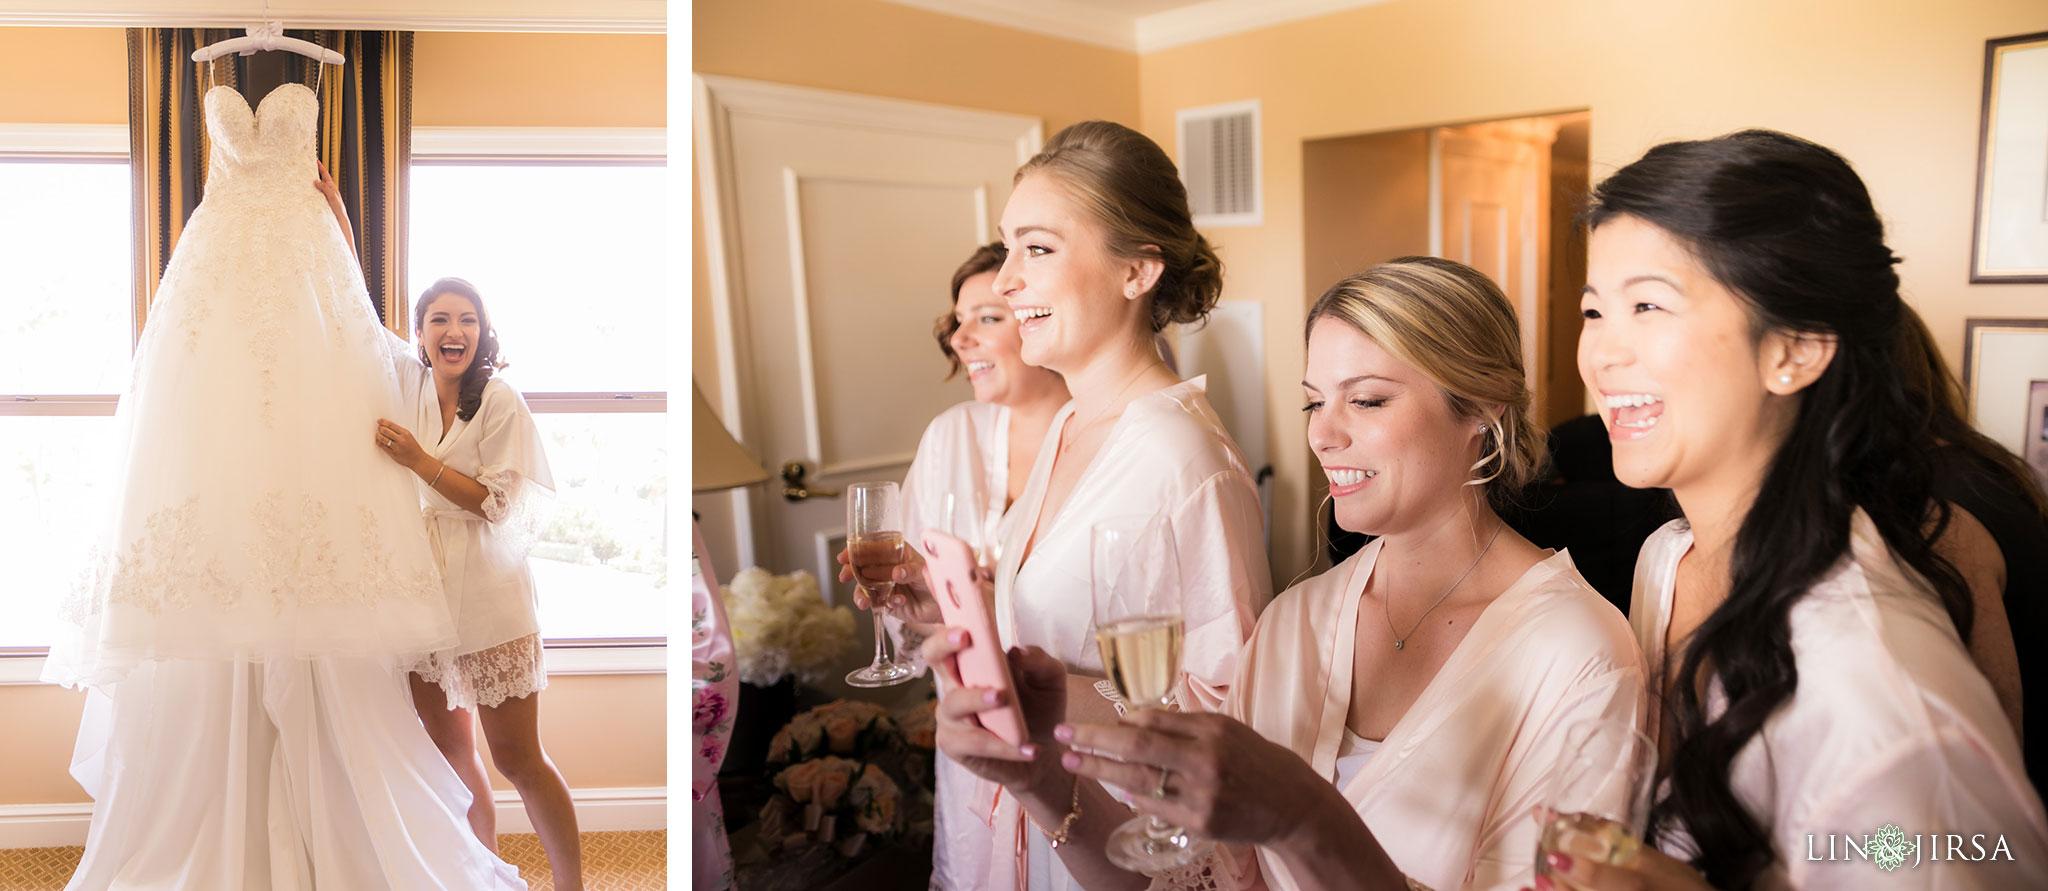 03 langham huntington pasadena bride wedding photography